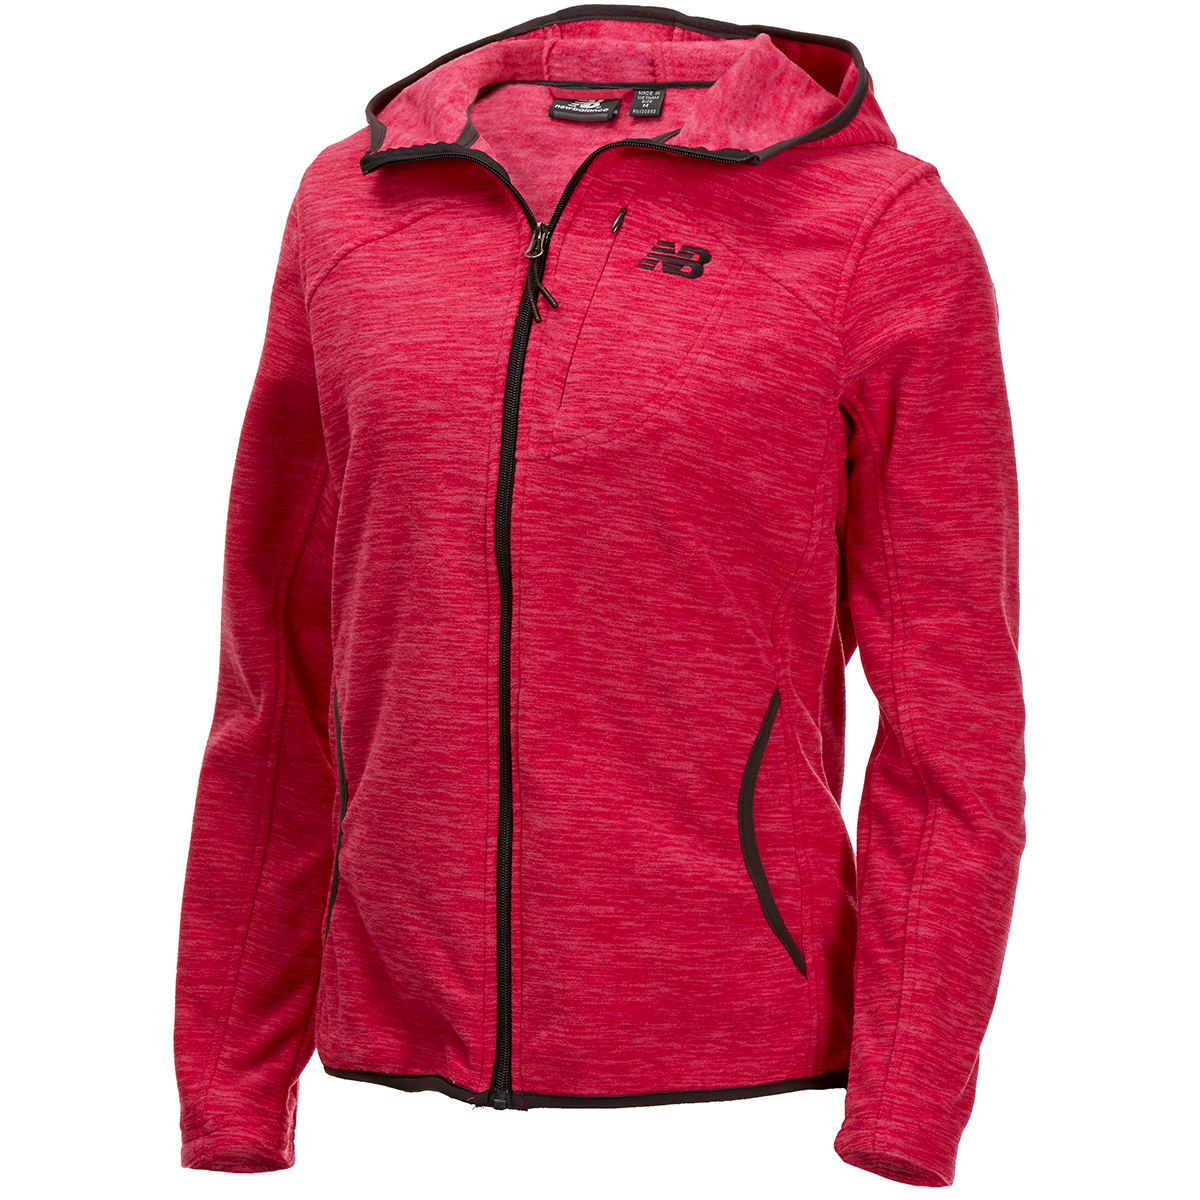 New Balance Women's Polar Fleece Space-Dye Full-Zip Hoodie - Red, M